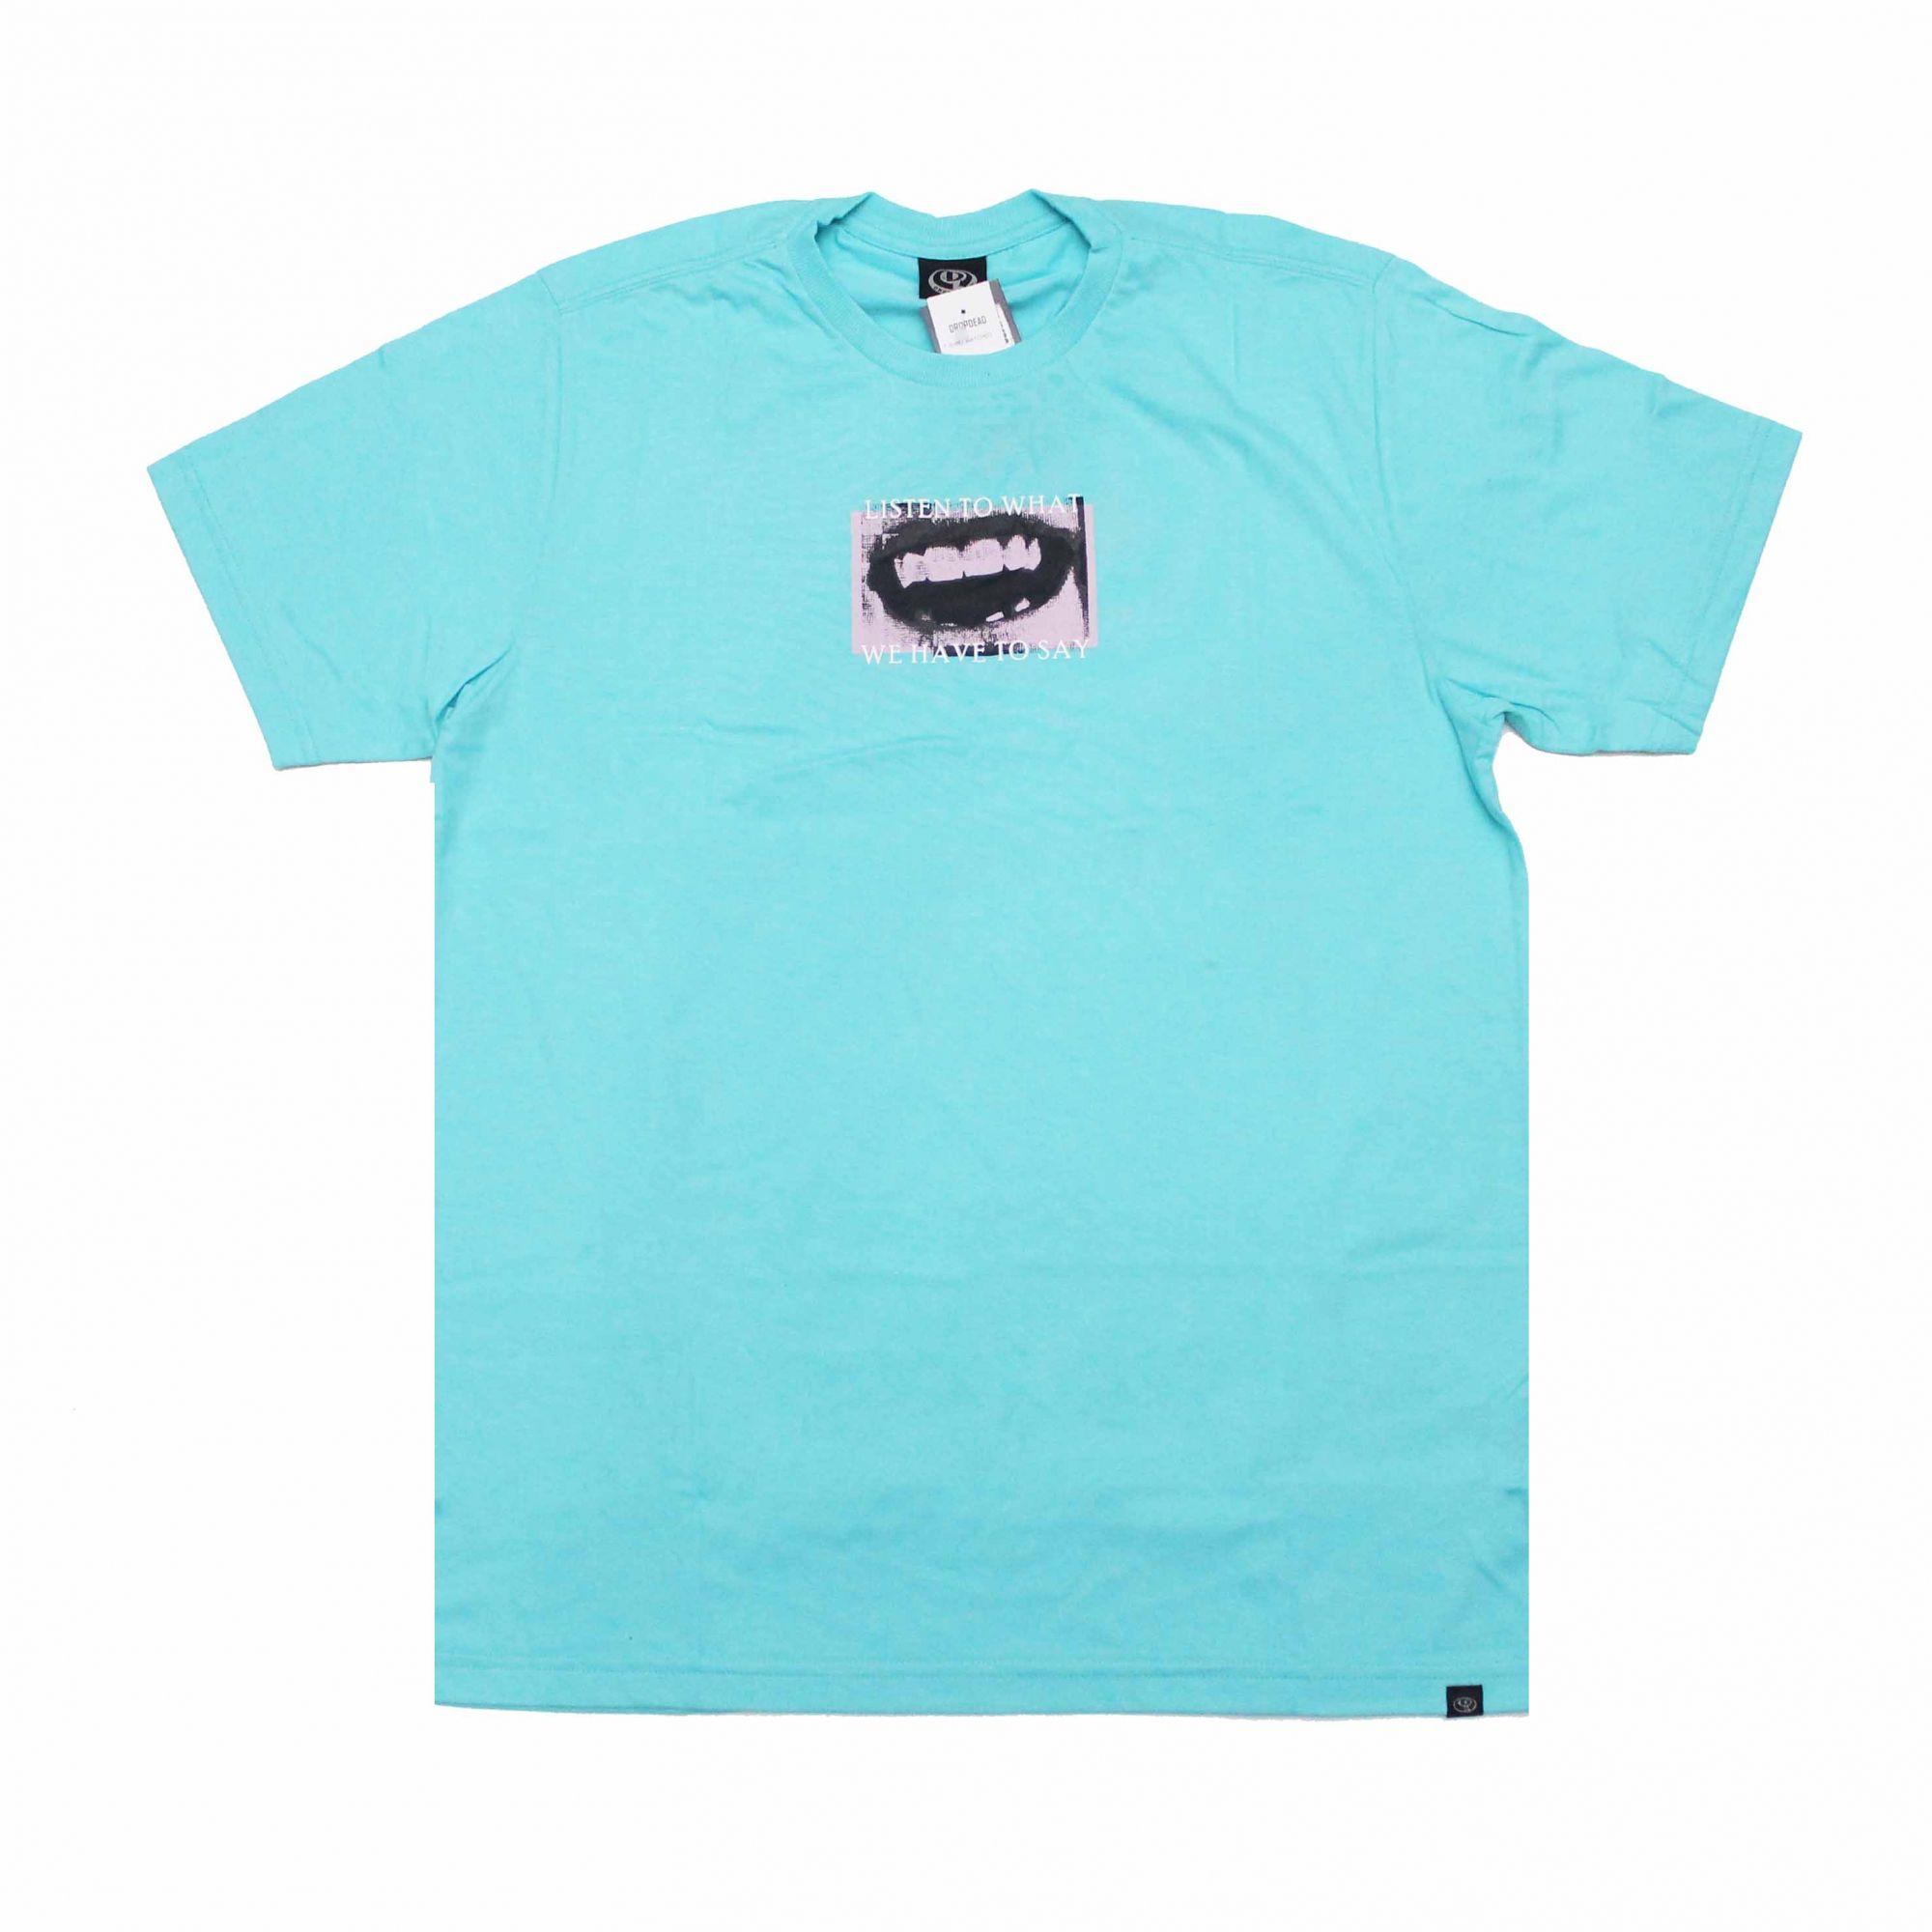 Camiseta Drop Dead Watch Azul Turquesa